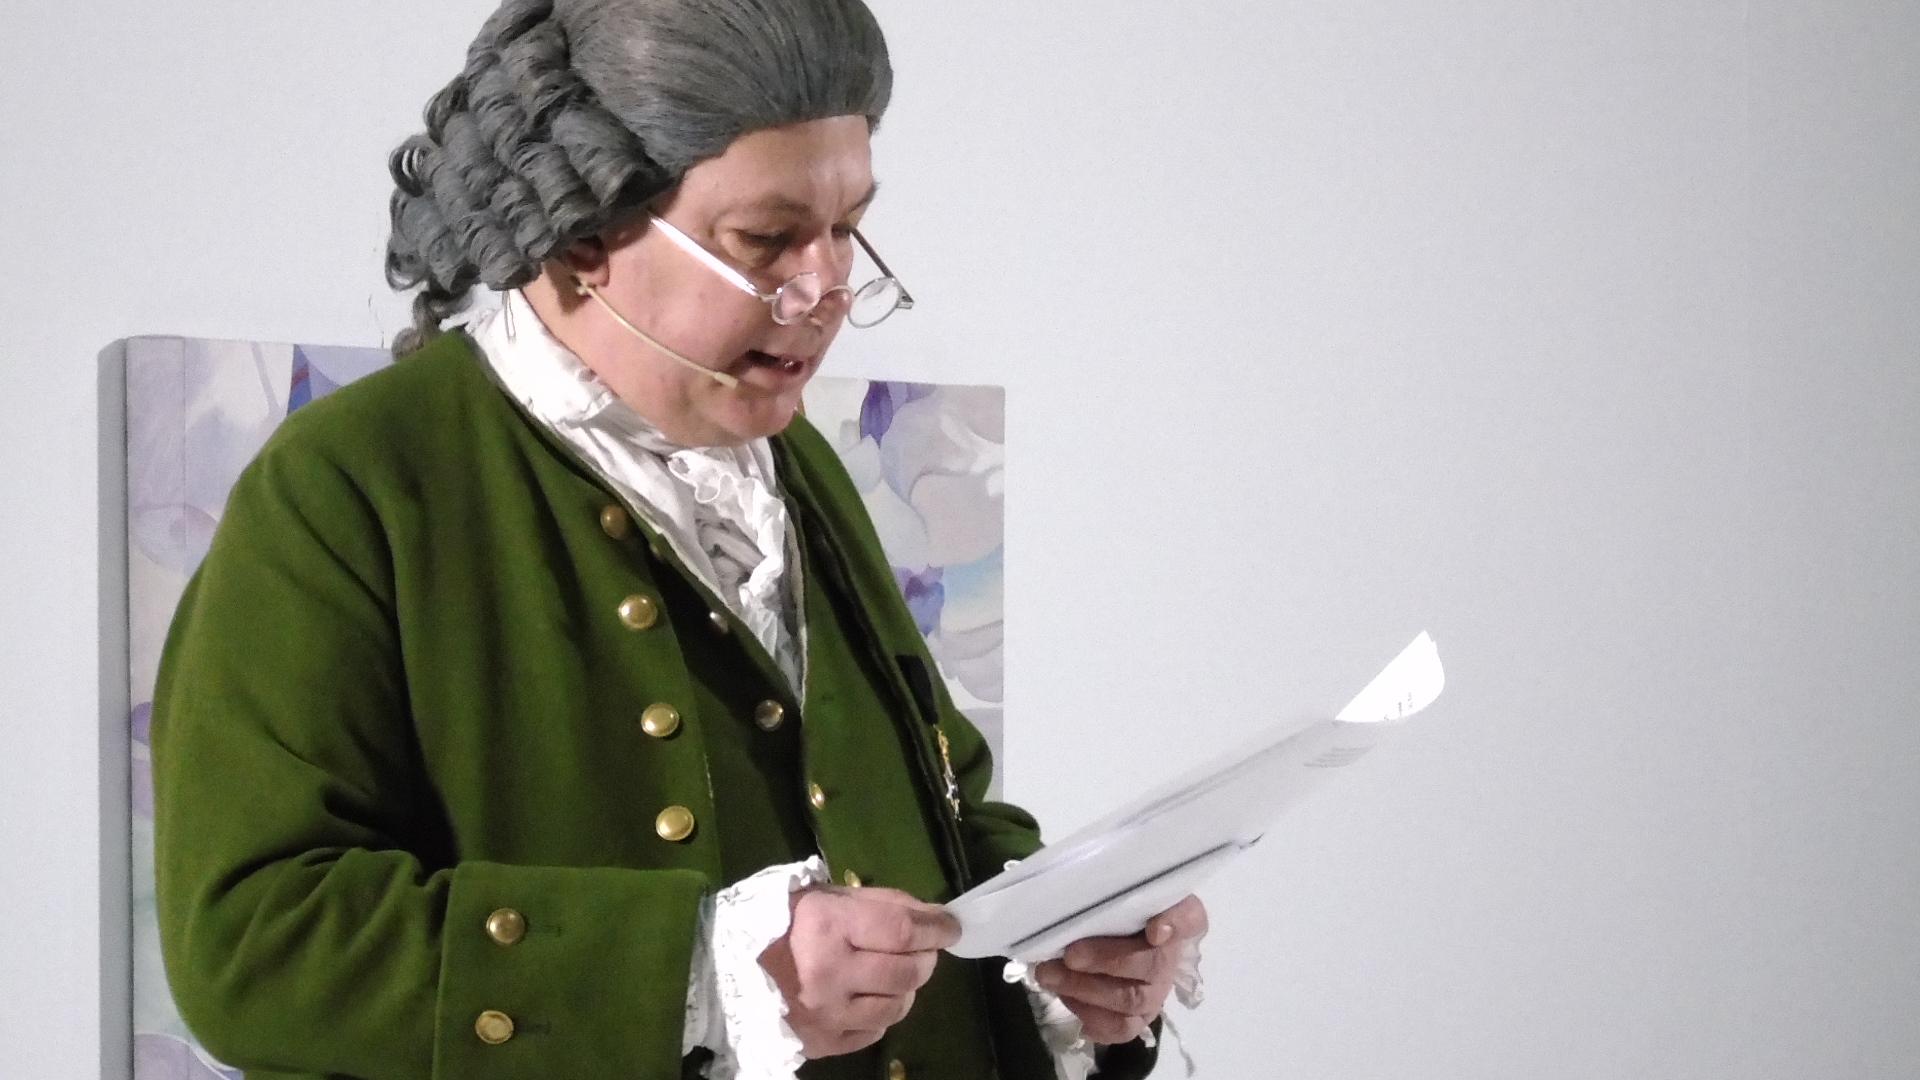 Carl Linnaeus played by Hans Odöö